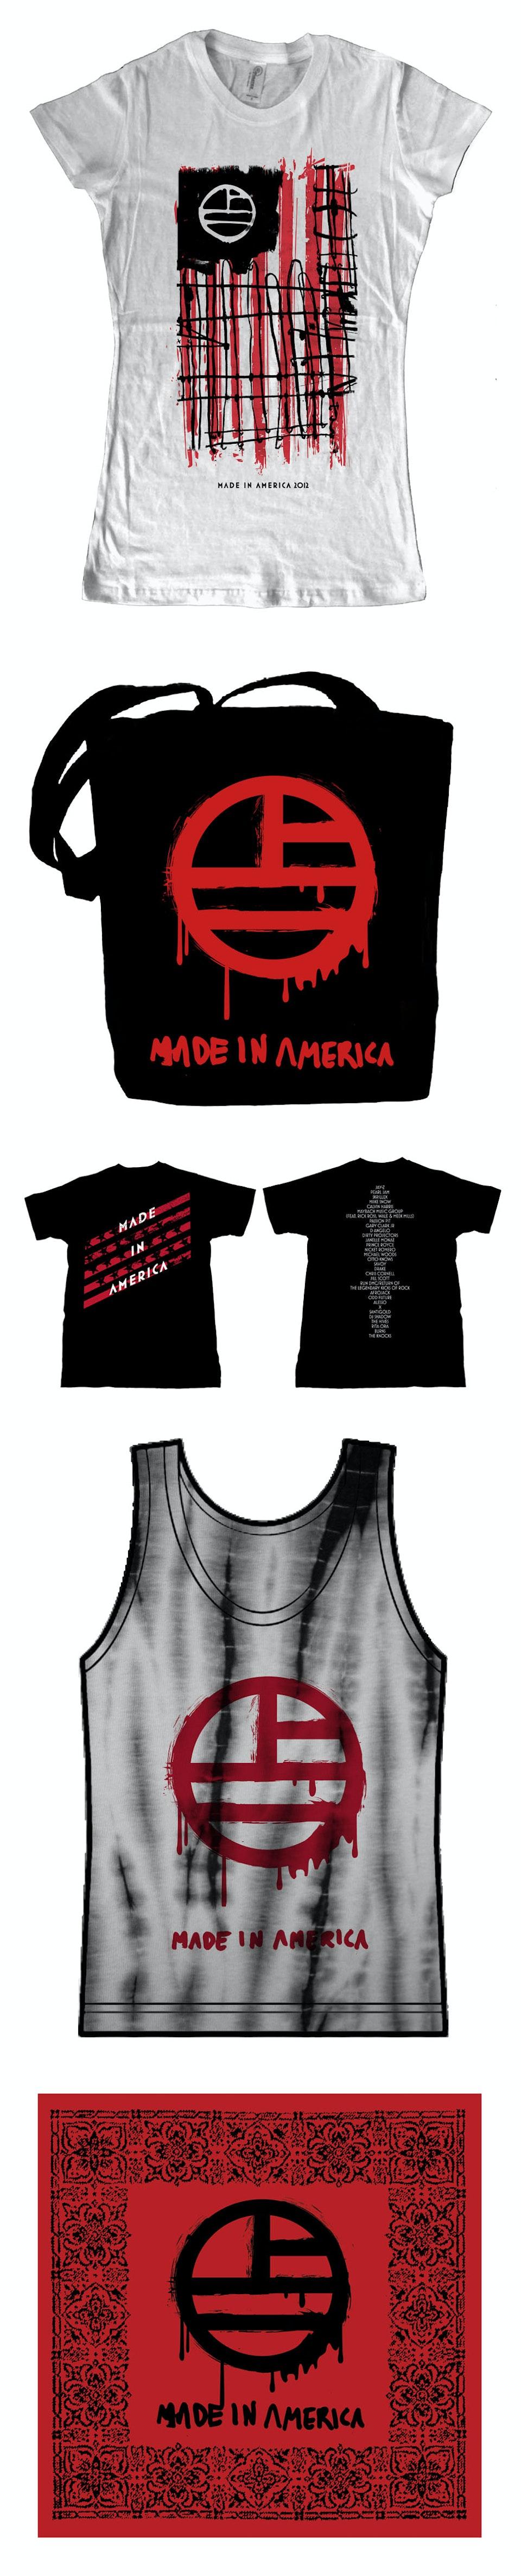 Merch for Made in America festival